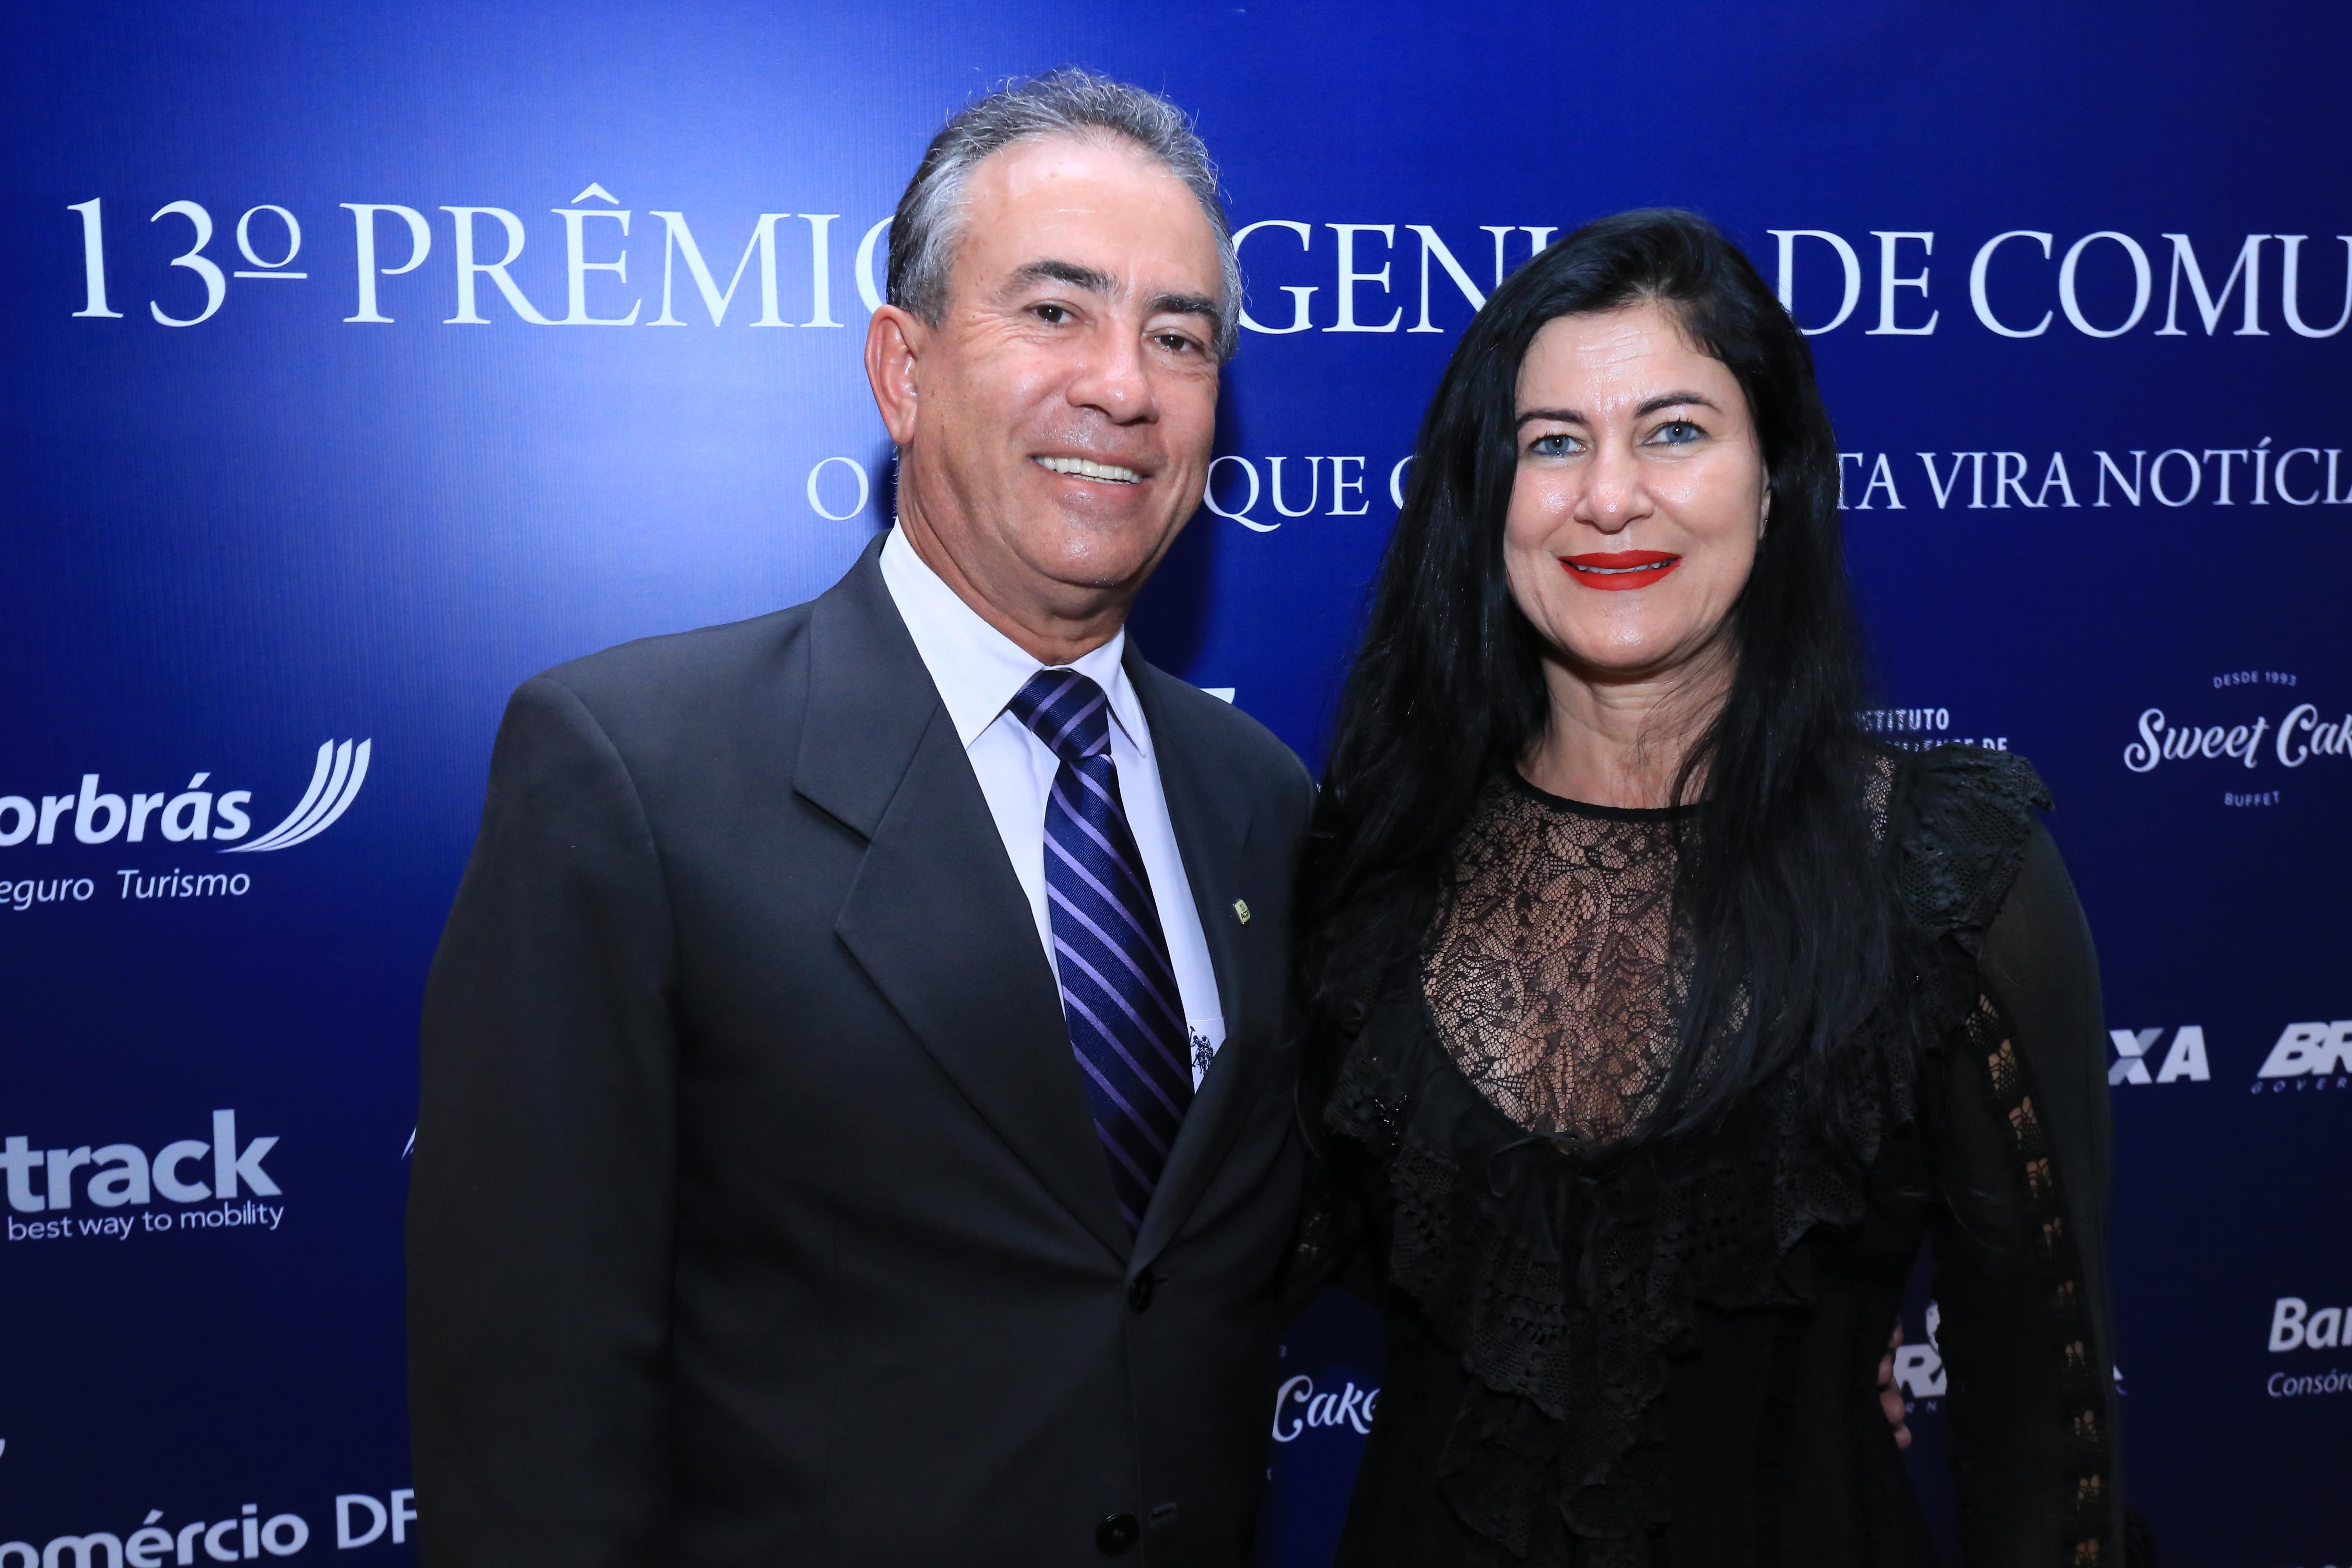 O presidente ACDF Cleber Pires e a esposa Cida Pires